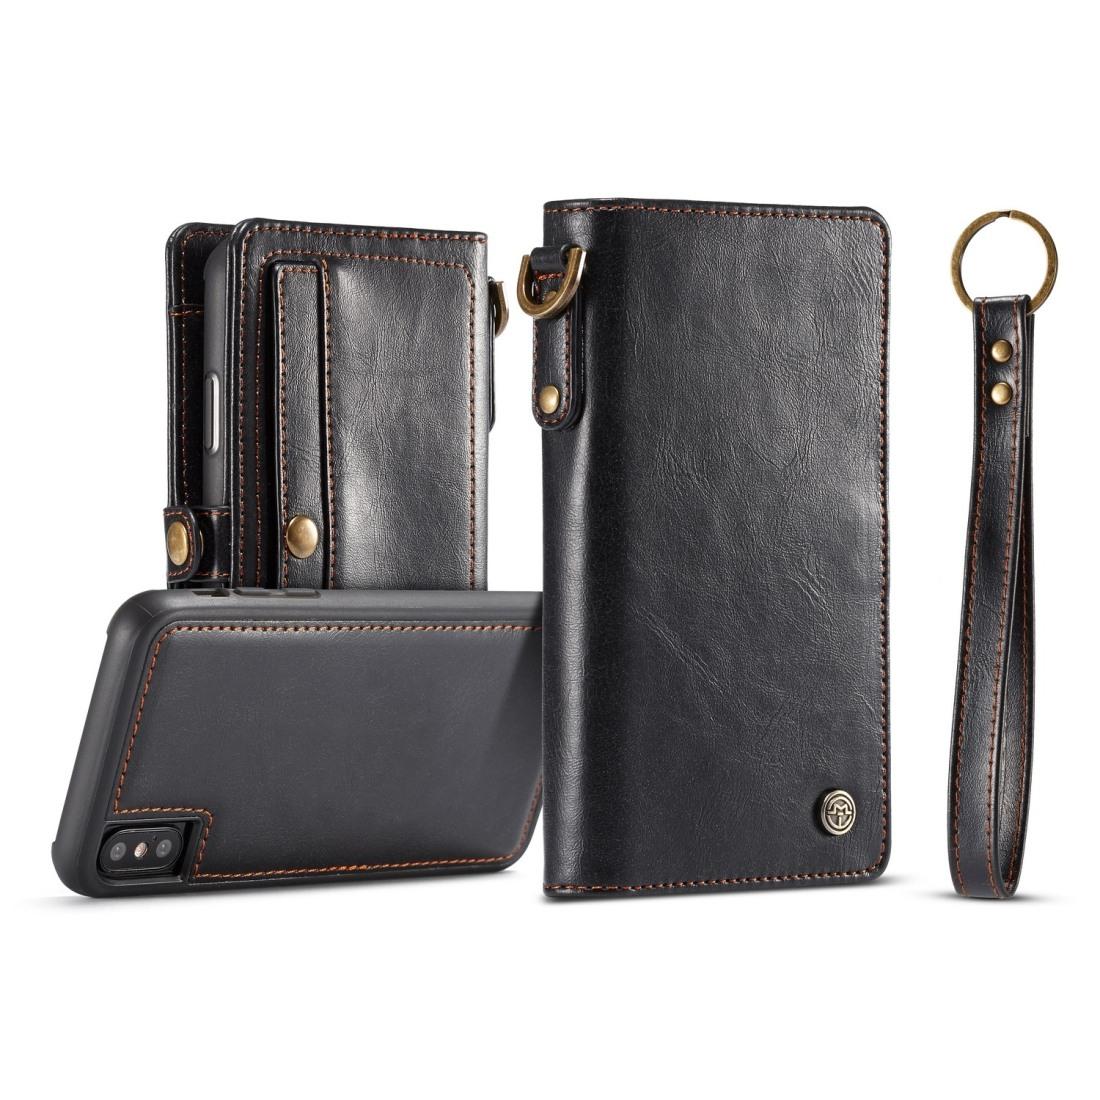 CaseMe för iPhone X - Plånboksfodral med skal PU-läder  0b0904c7eaa18